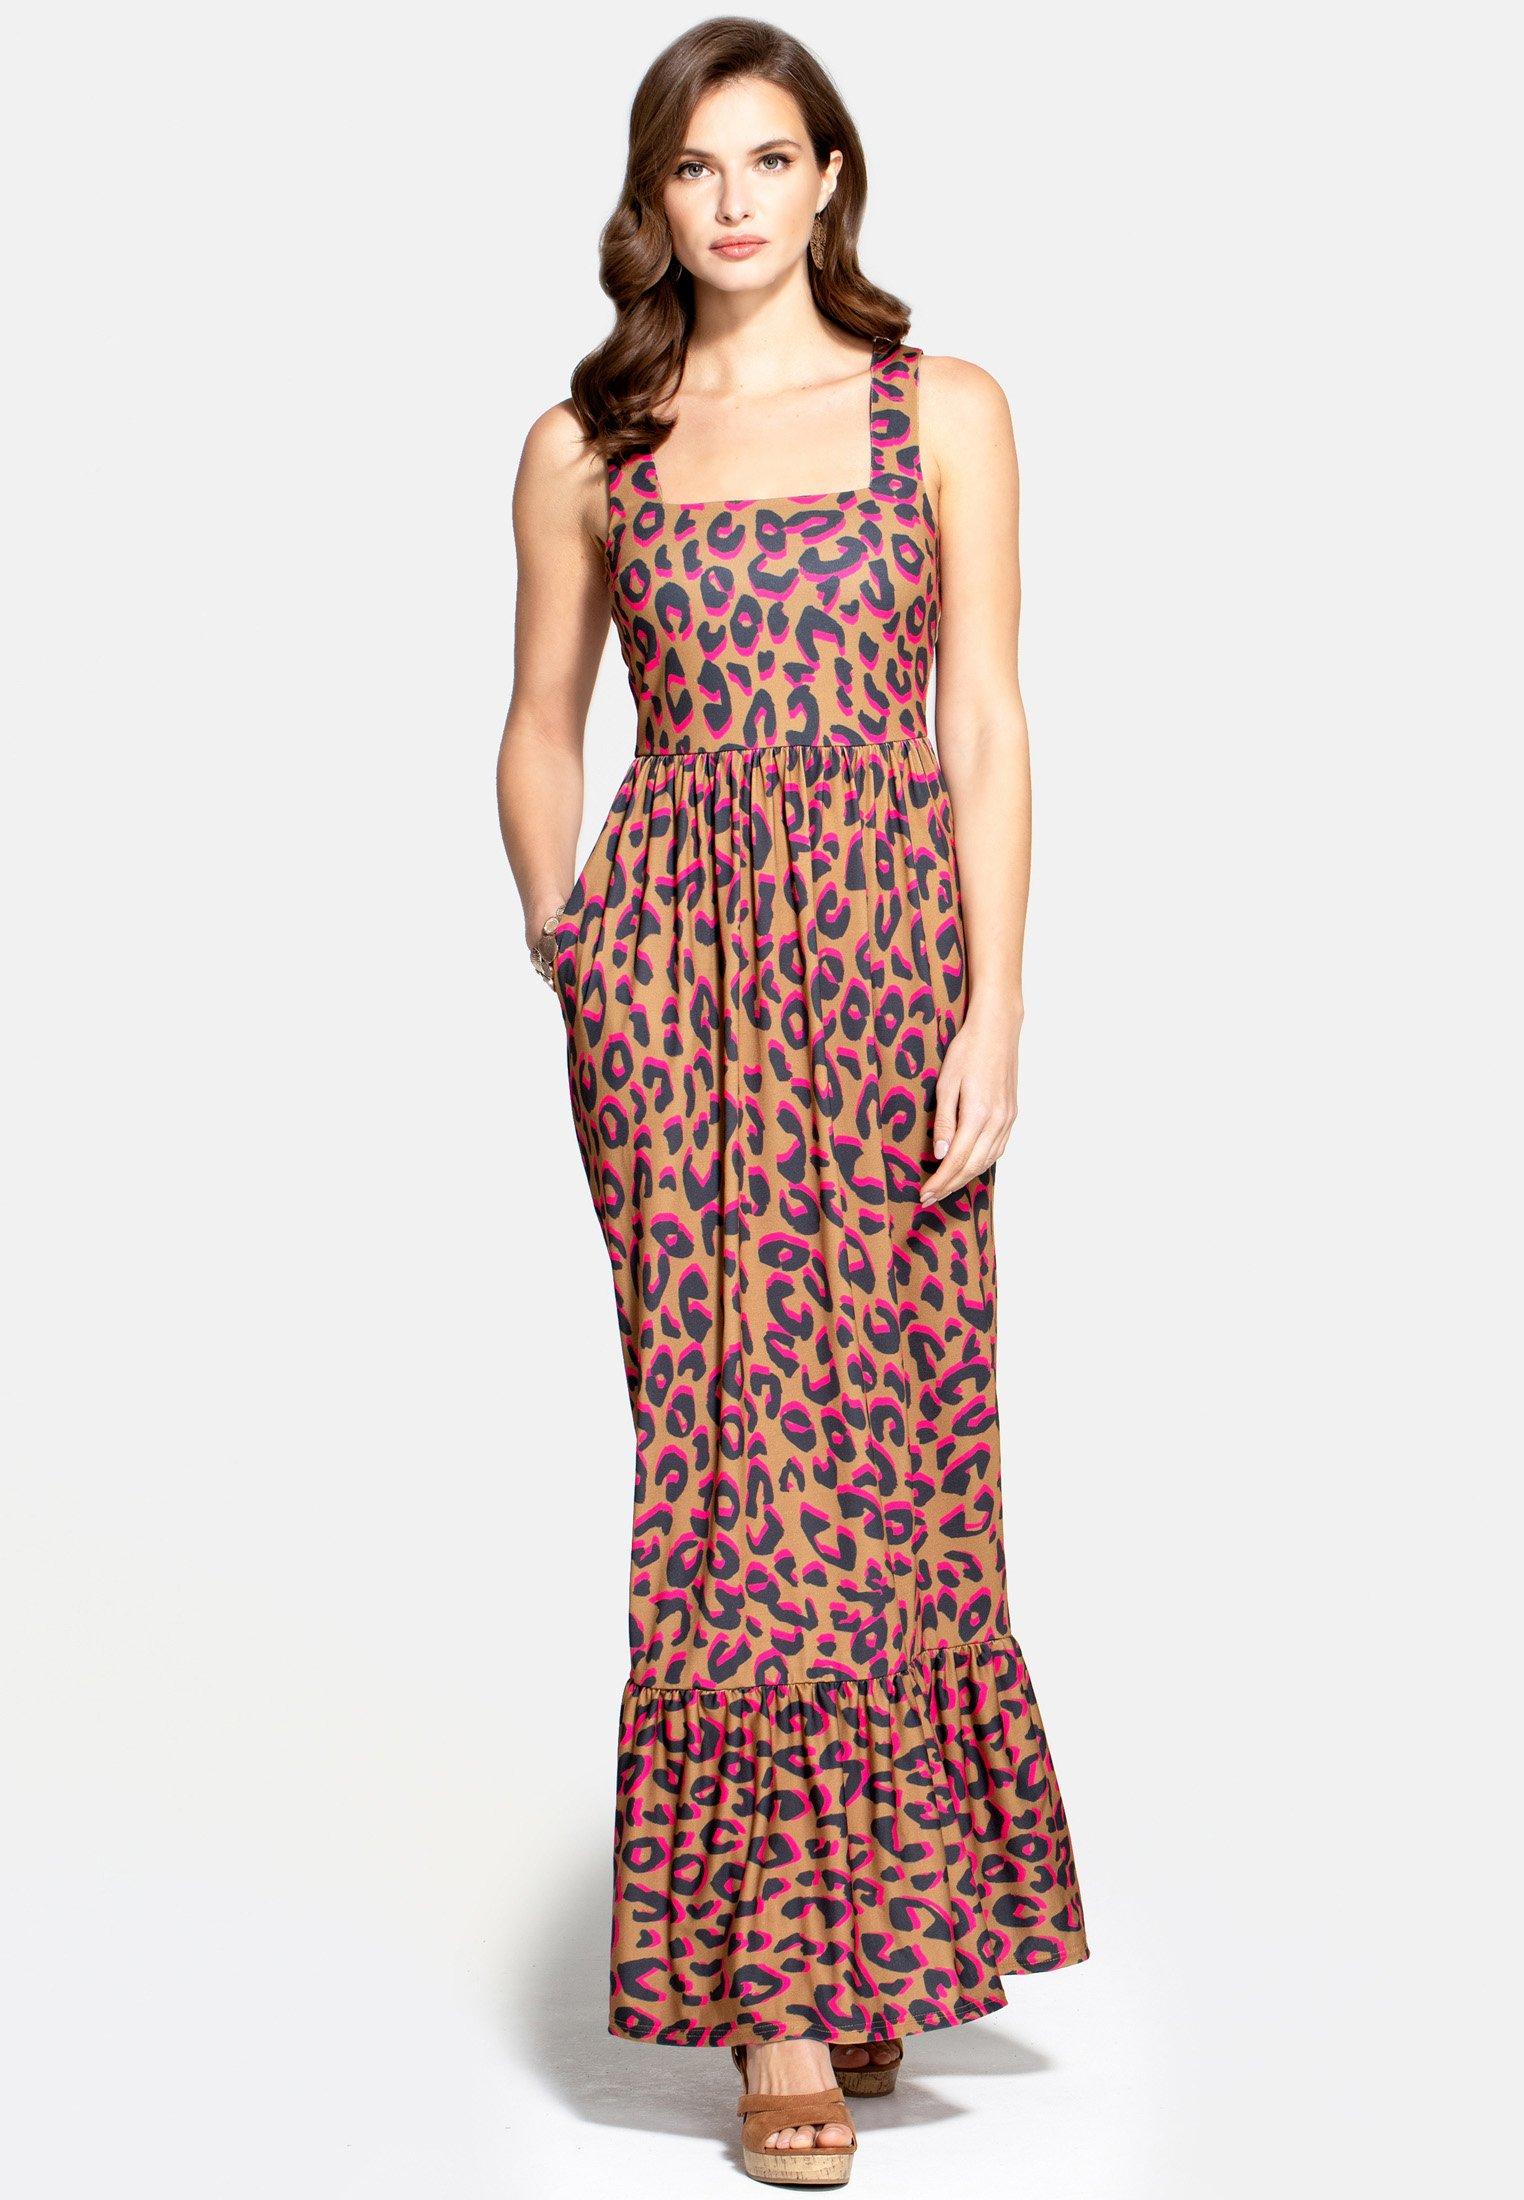 Best Seller Women's Clothing HotSquash Maxi dress brown kJIDGSZHm